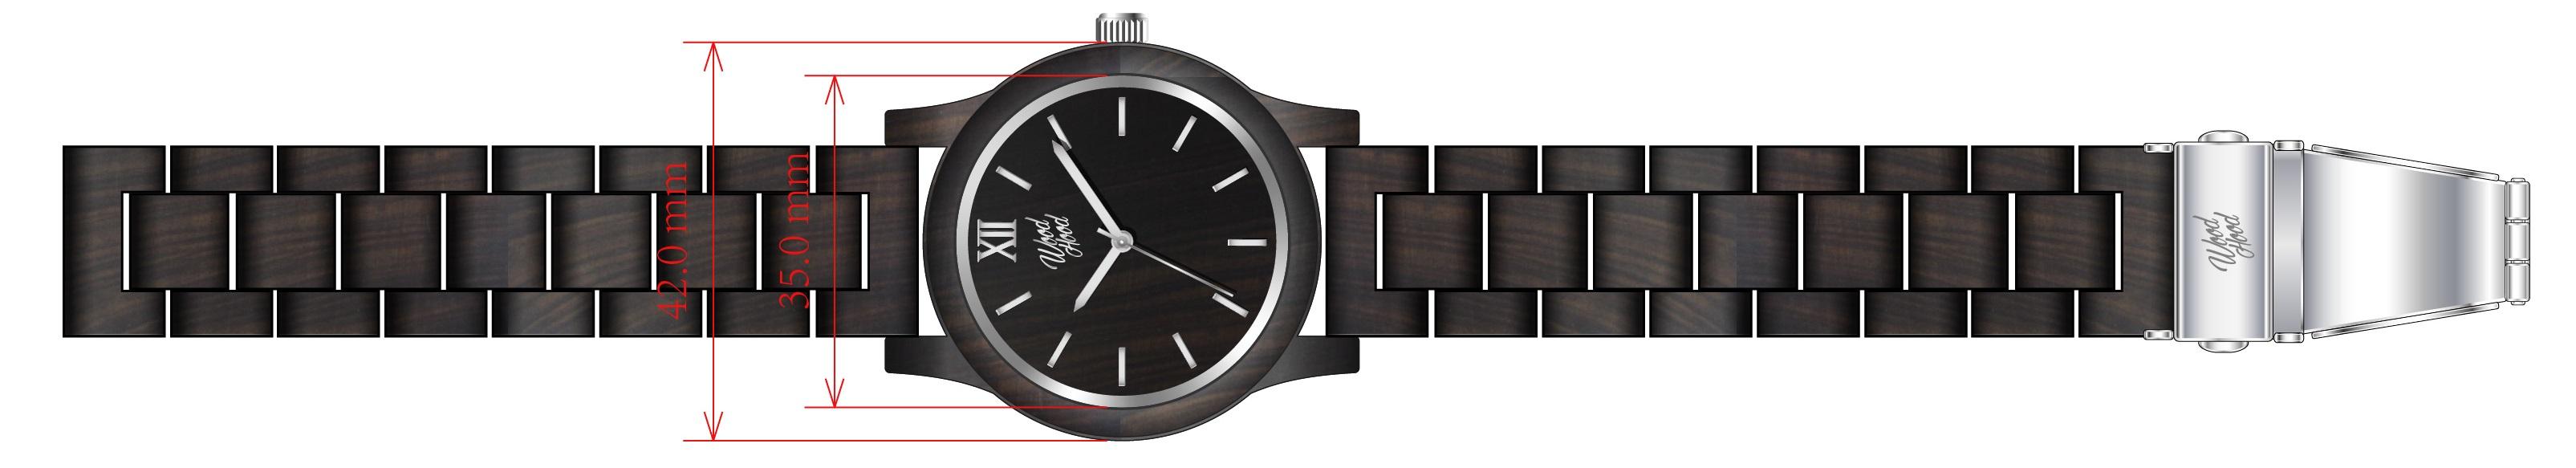 Dřevěné hodinky Dark Chocolate, rozměry.